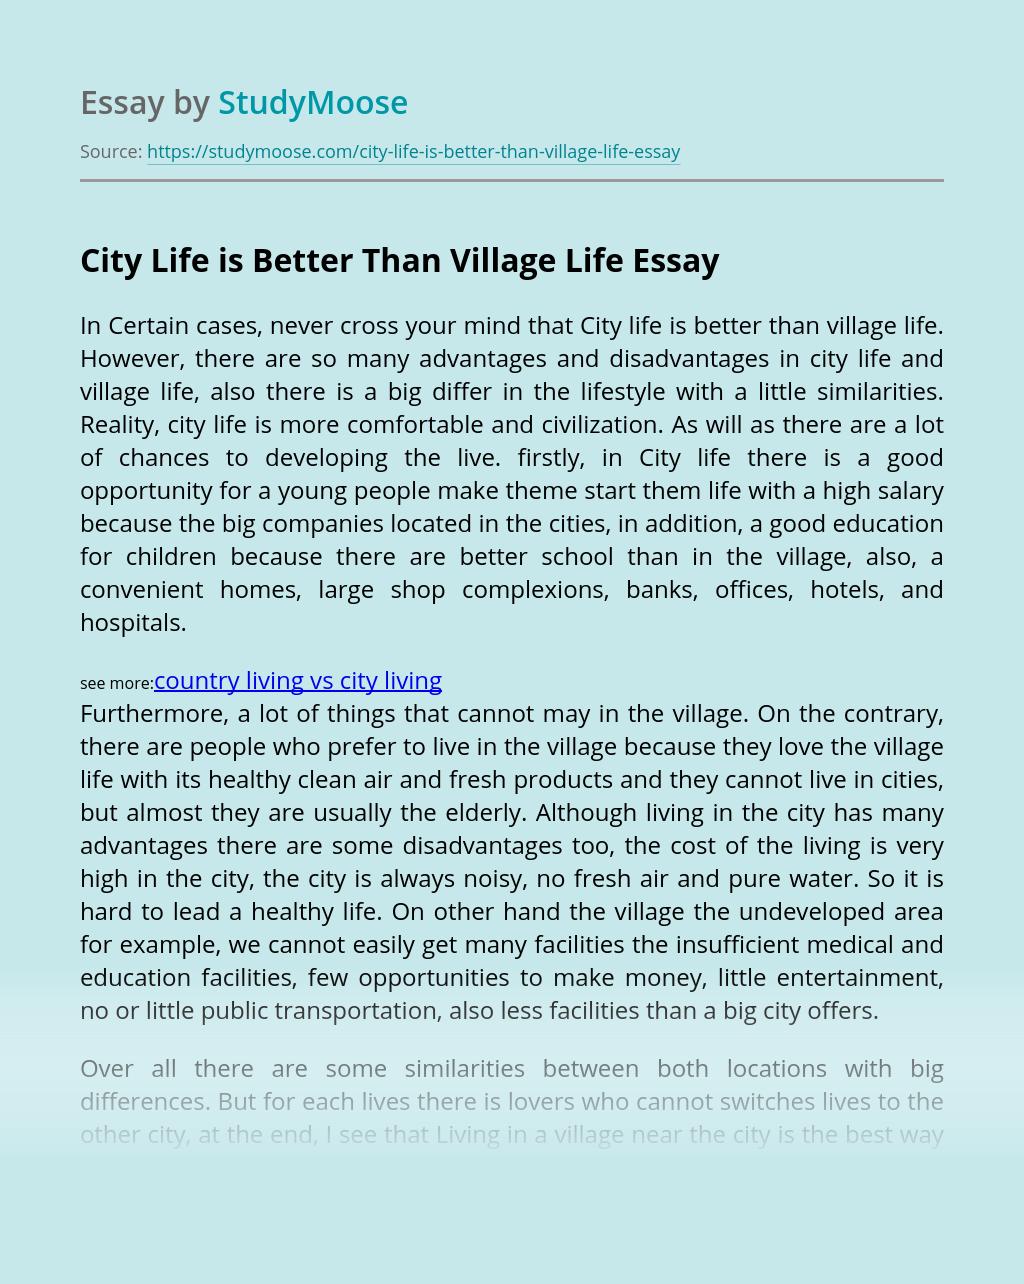 Country living vs city living